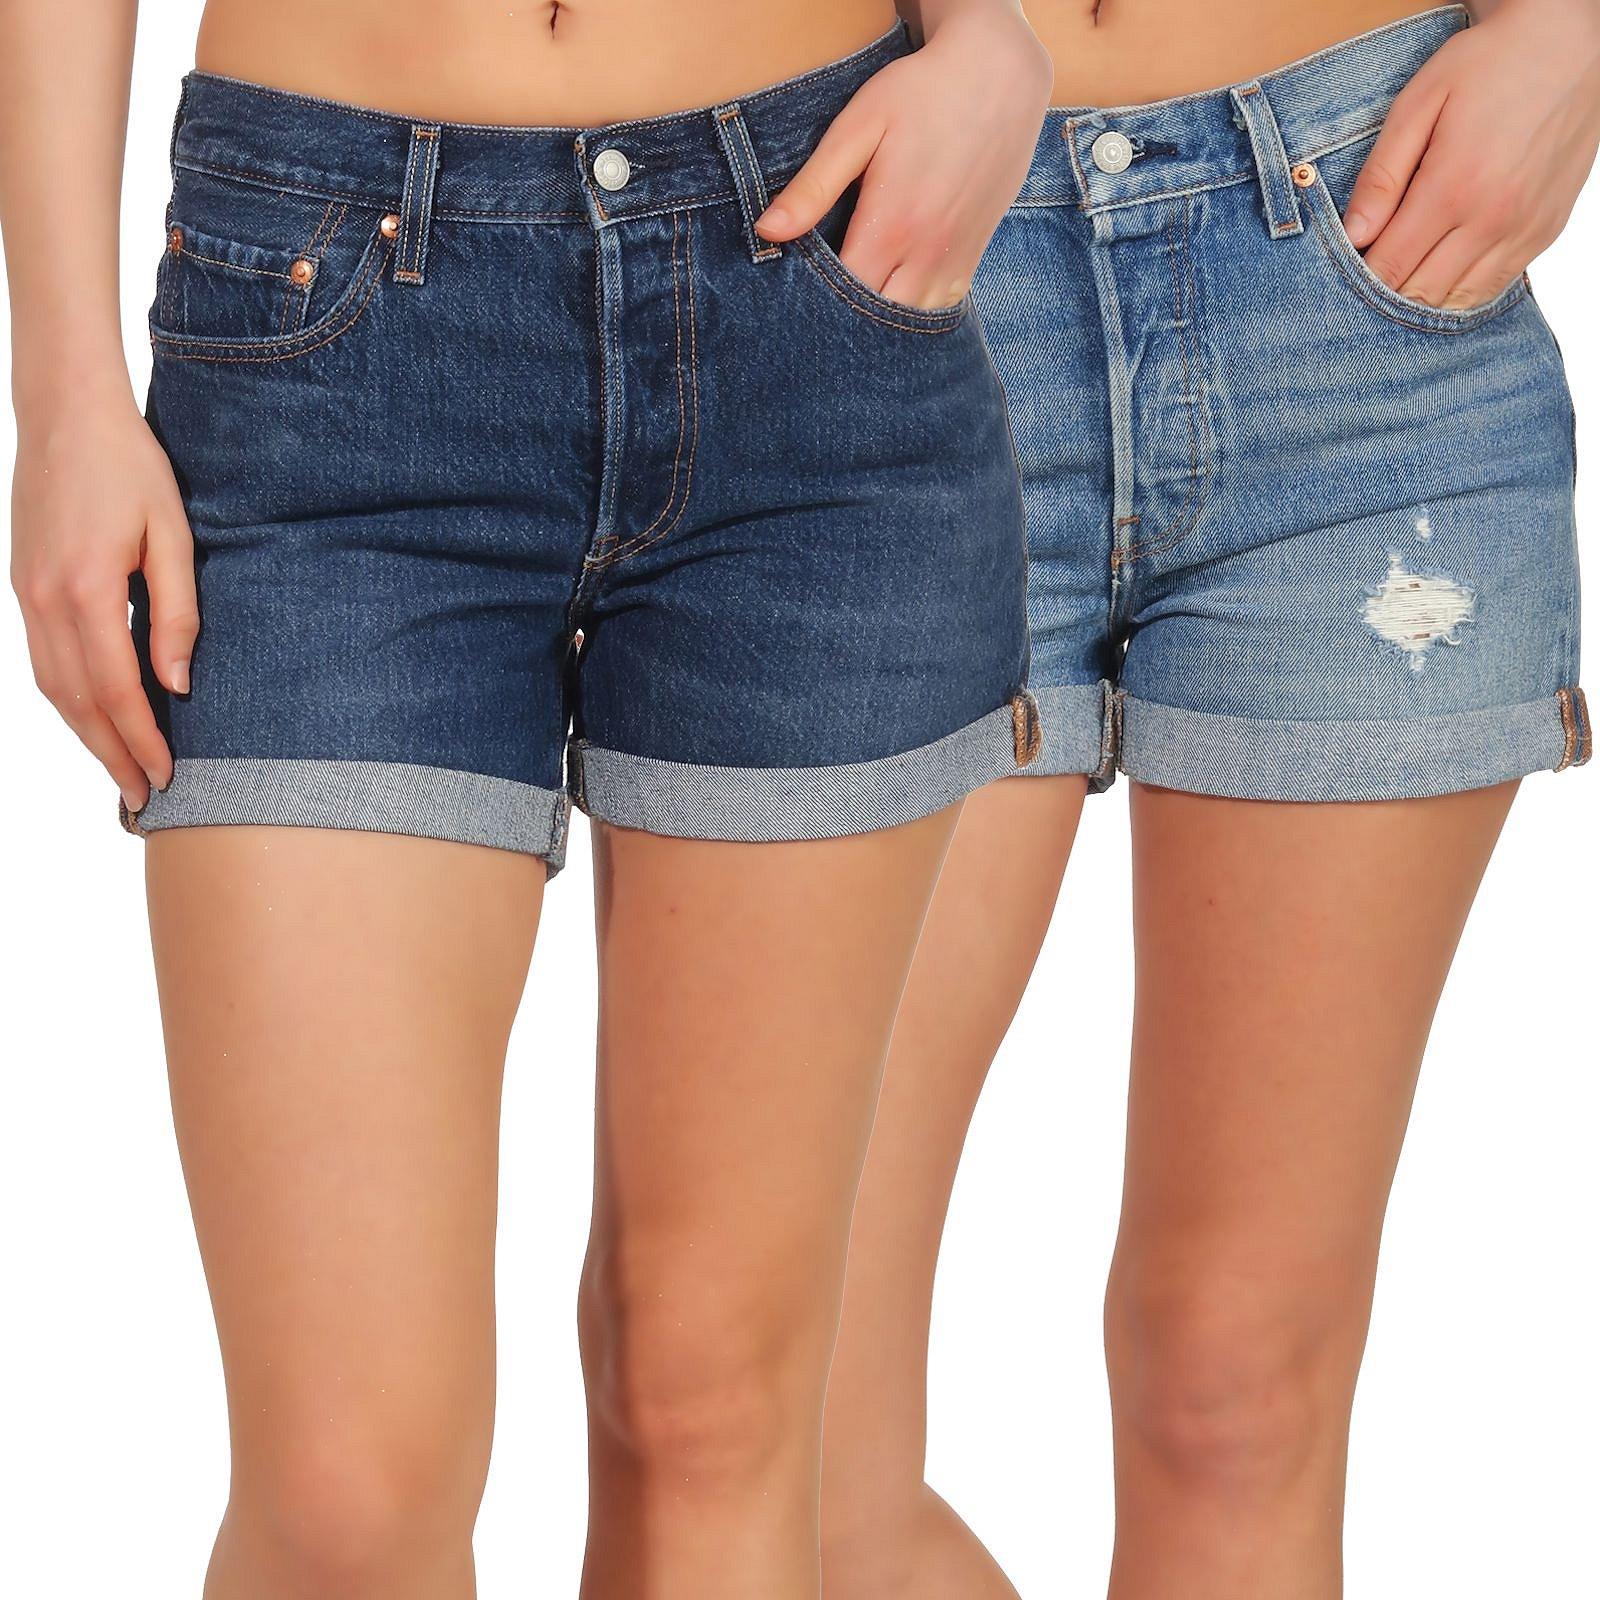 Levi`s Shorts Denim Damenhose Hose Damen Details Kurze Bermuda Hotpants Zu 29961 Jeans 501 FK1lJ5ucT3